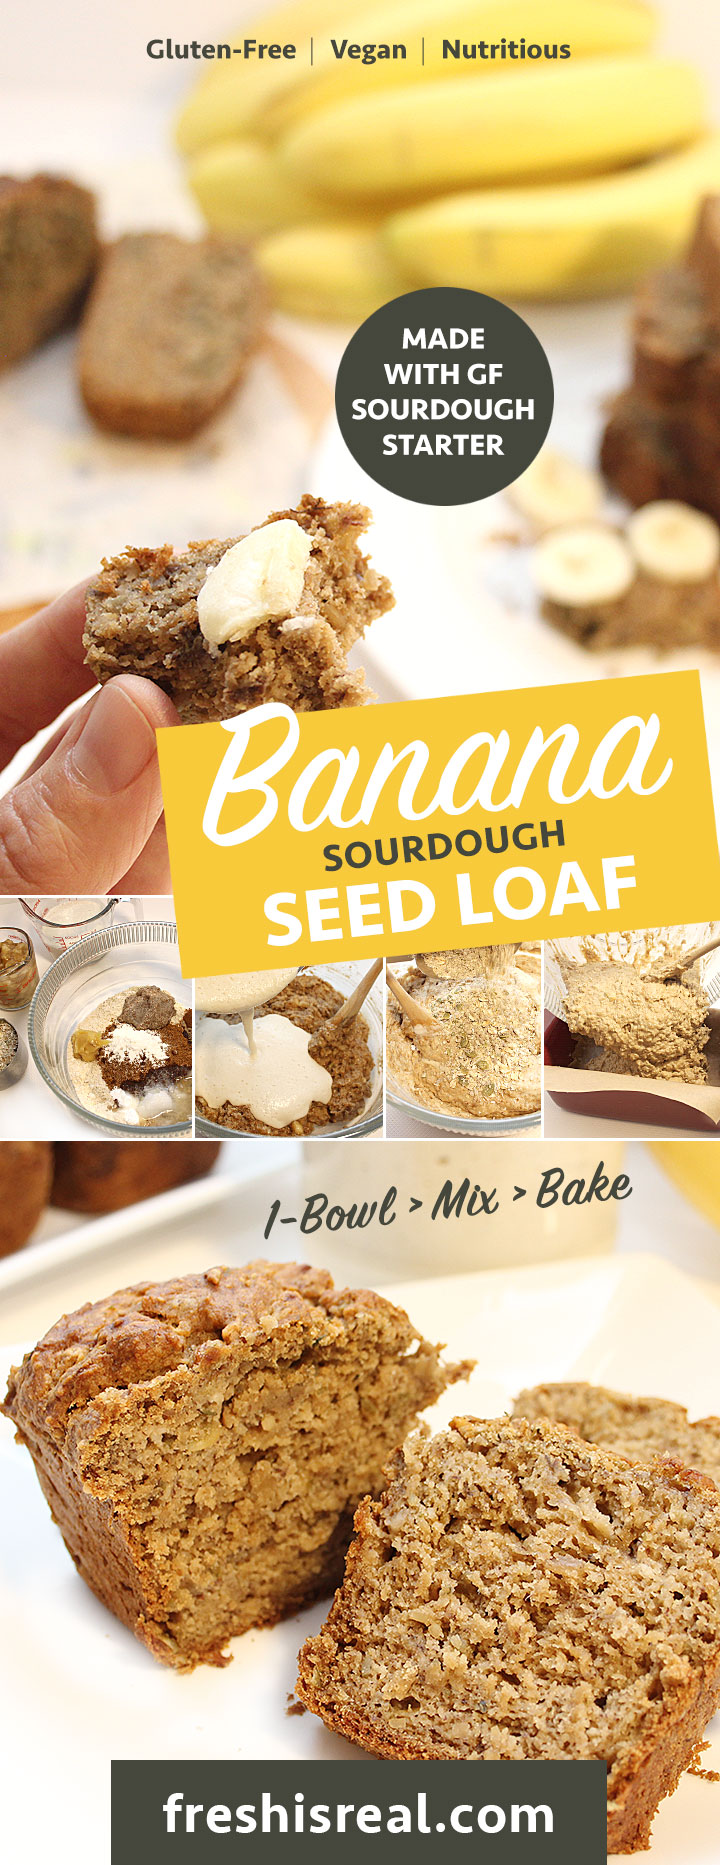 1-Bowl > Mix > Bake! Banana Sourdough Seed Bread recipe - Vegan | Gluten-Free | Allergen-Friendly | freshisreal.com